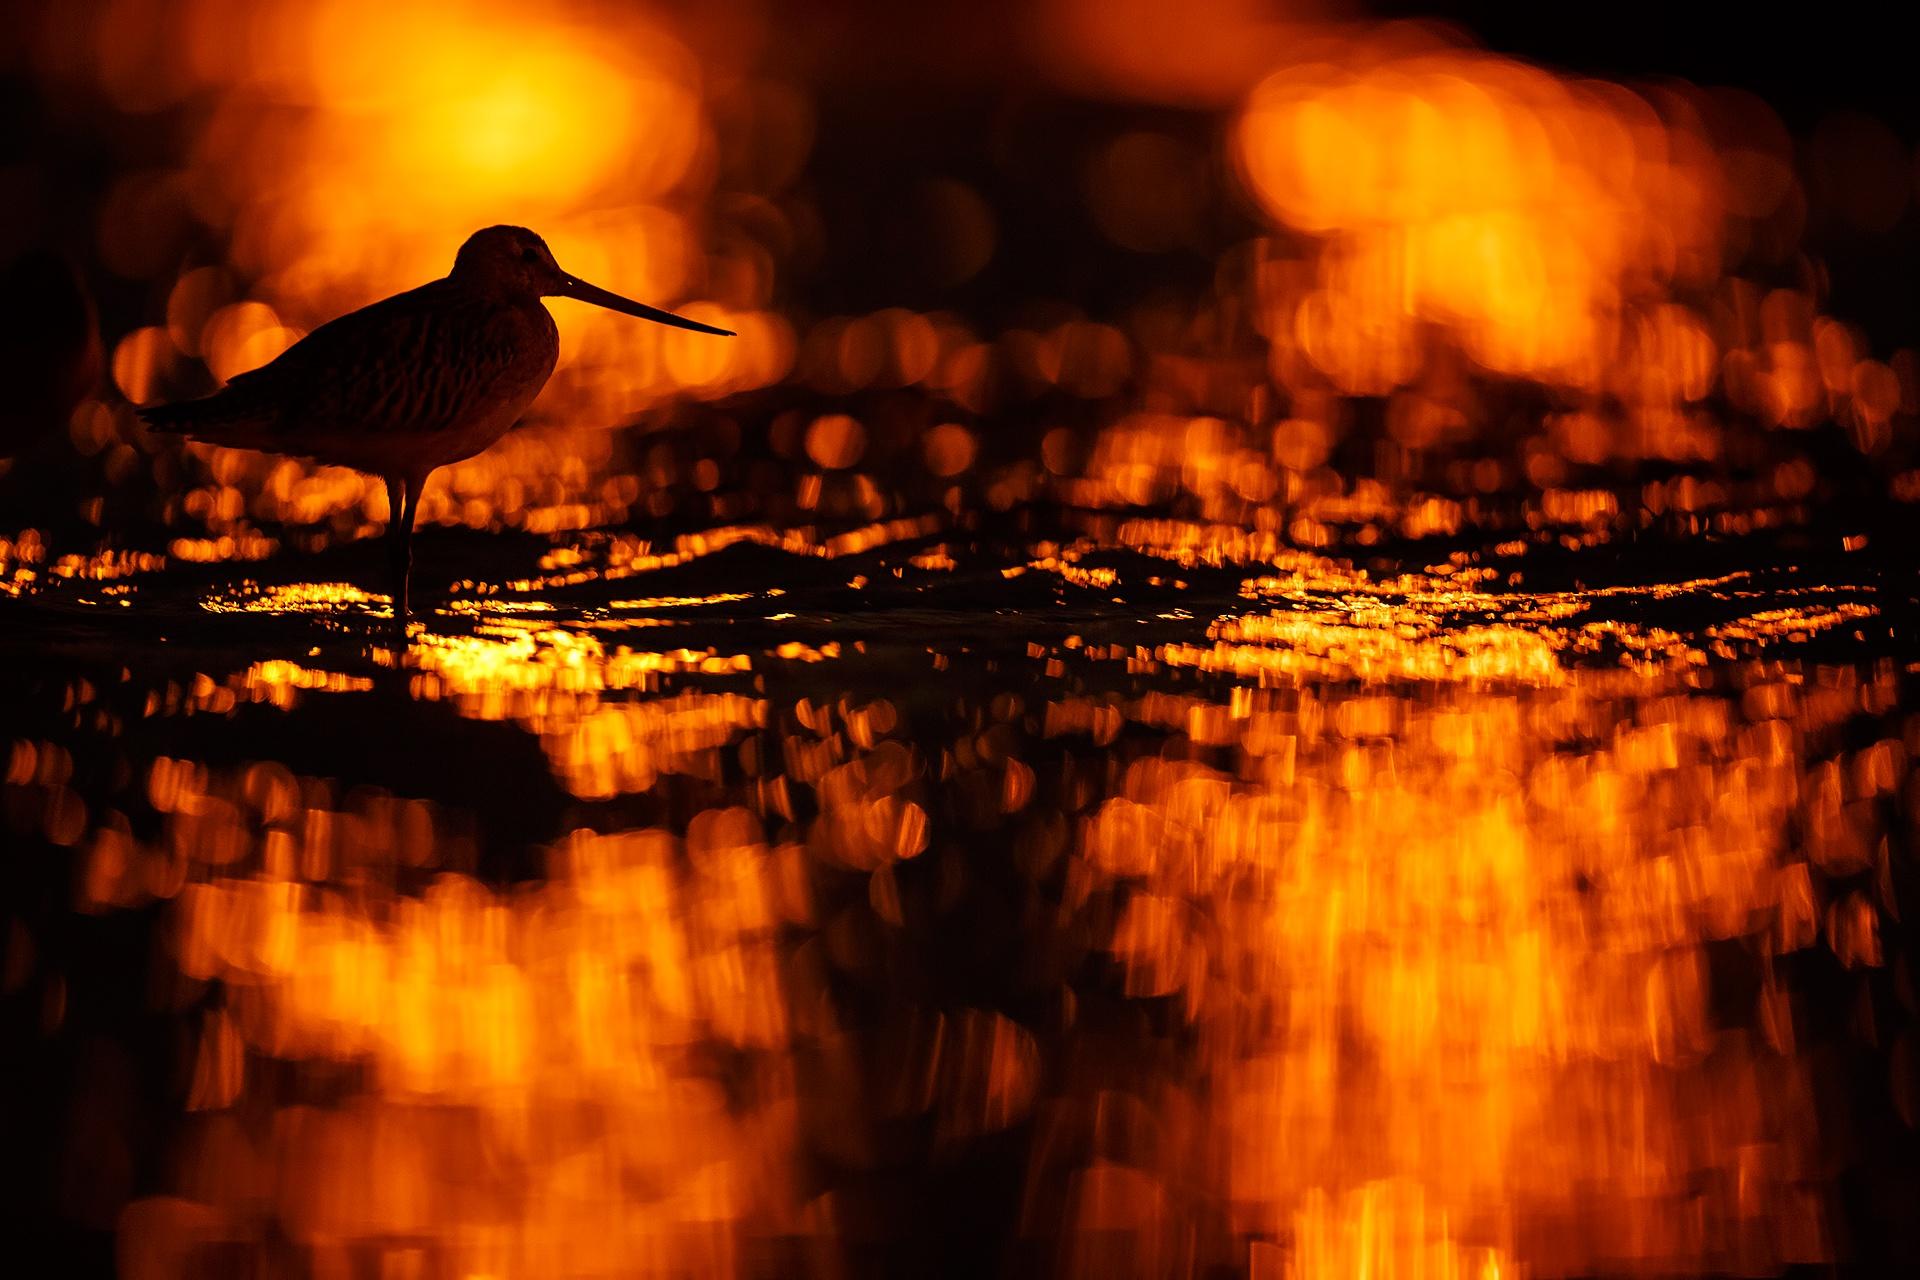 Bird of fire - Mario Suarez - Portfolio Natural, Fotografía de Naturaleza de Autor